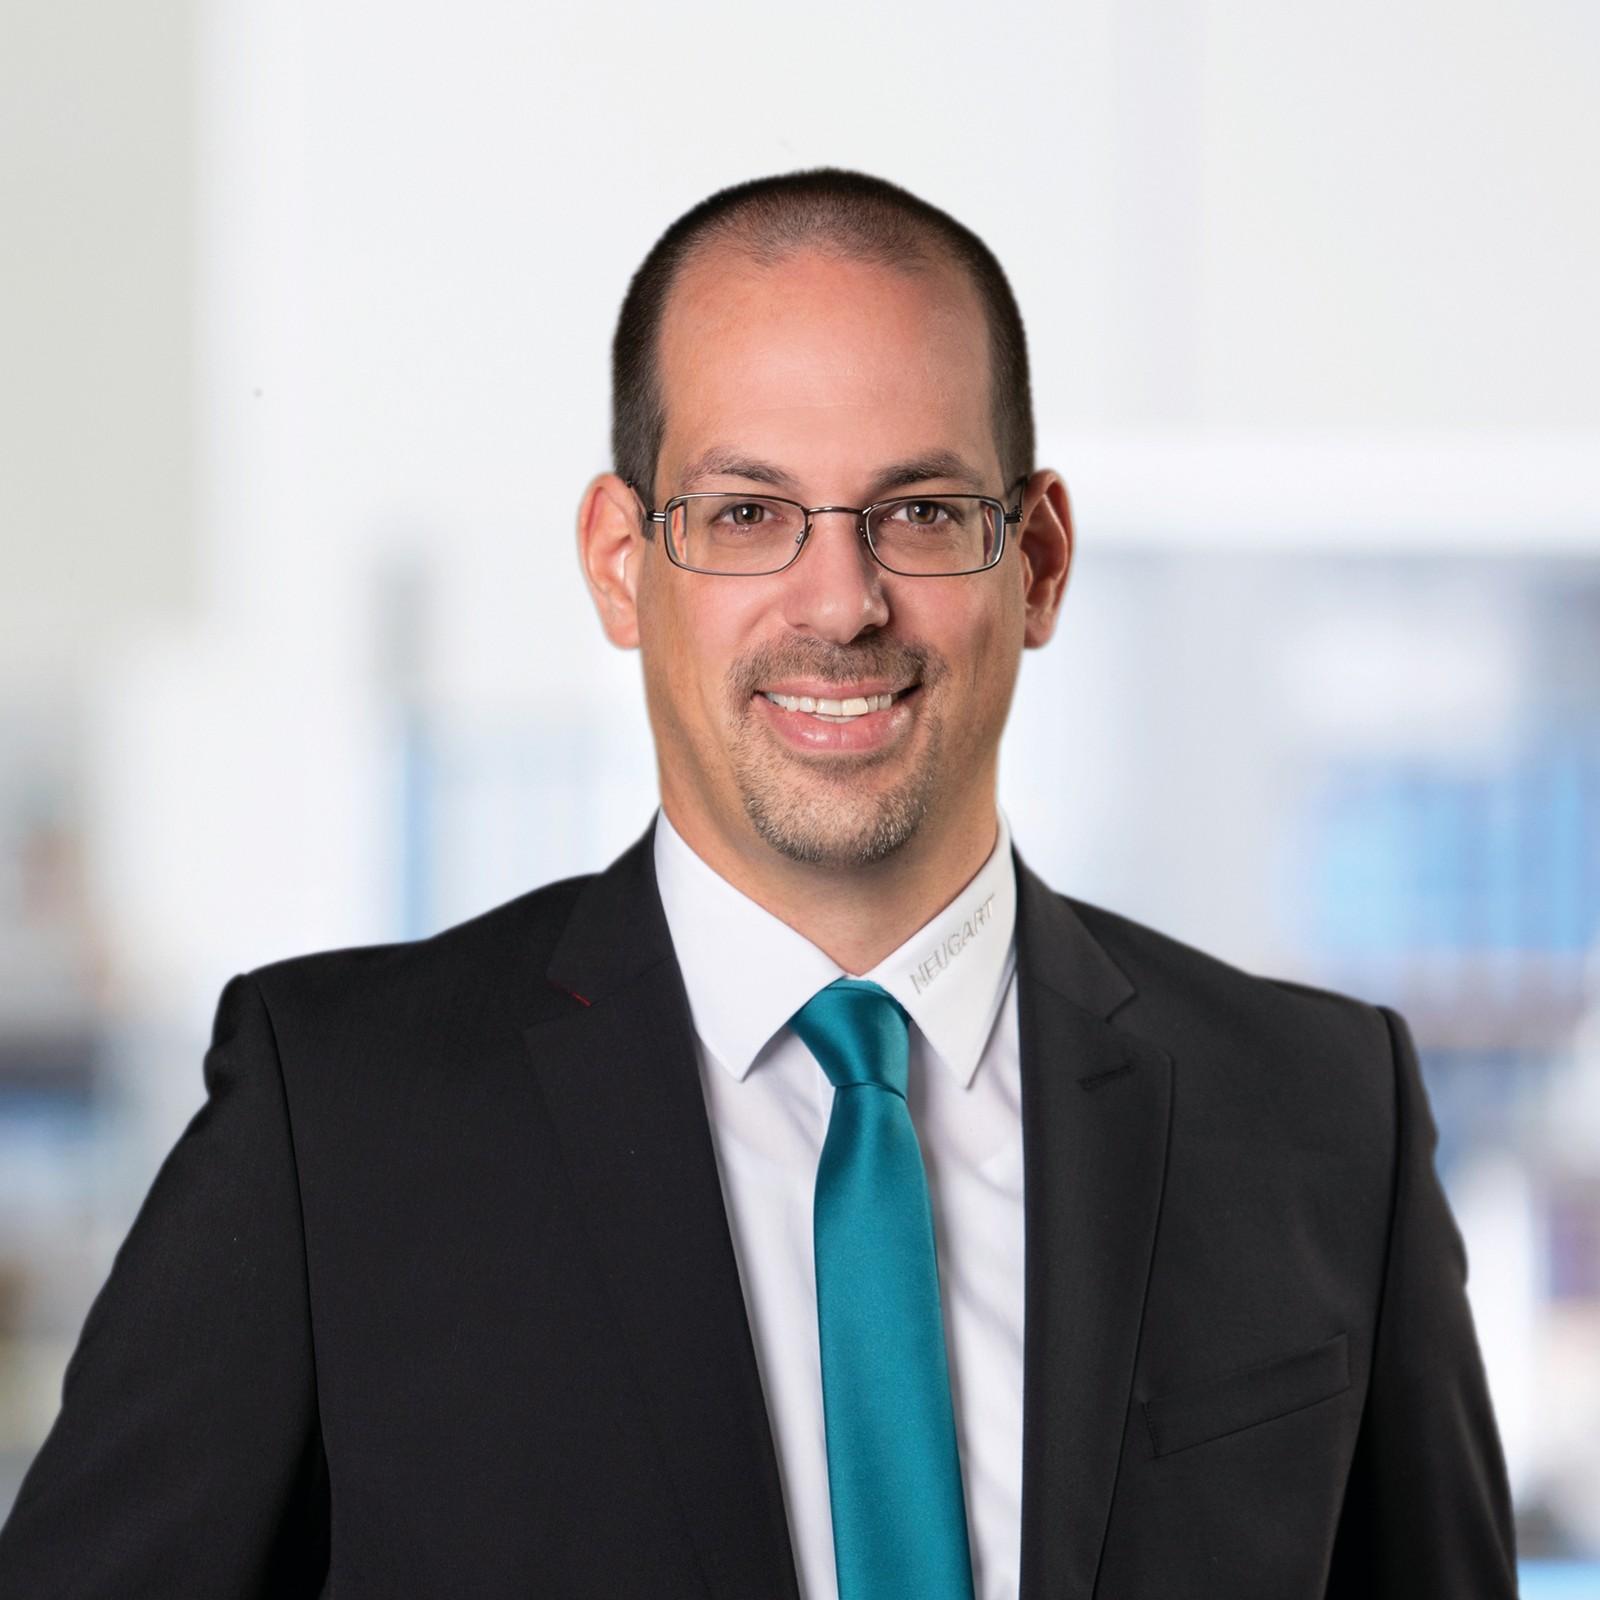 Christian Schilling ist neuer Vice President der Neugart USA Corp.